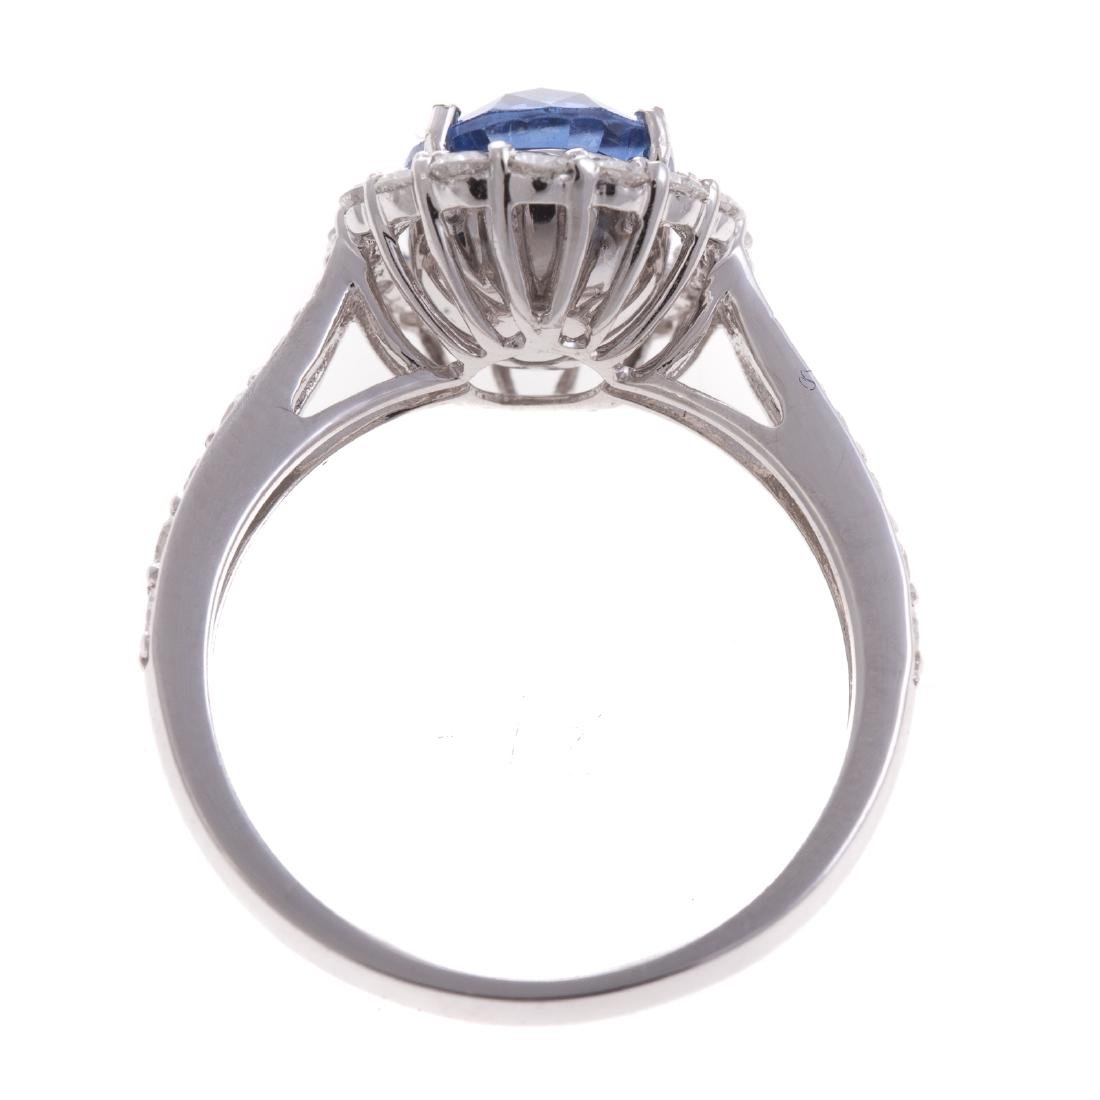 A Lady's 3.21 ct Unheated Sapphire & Diamond Ring - 3